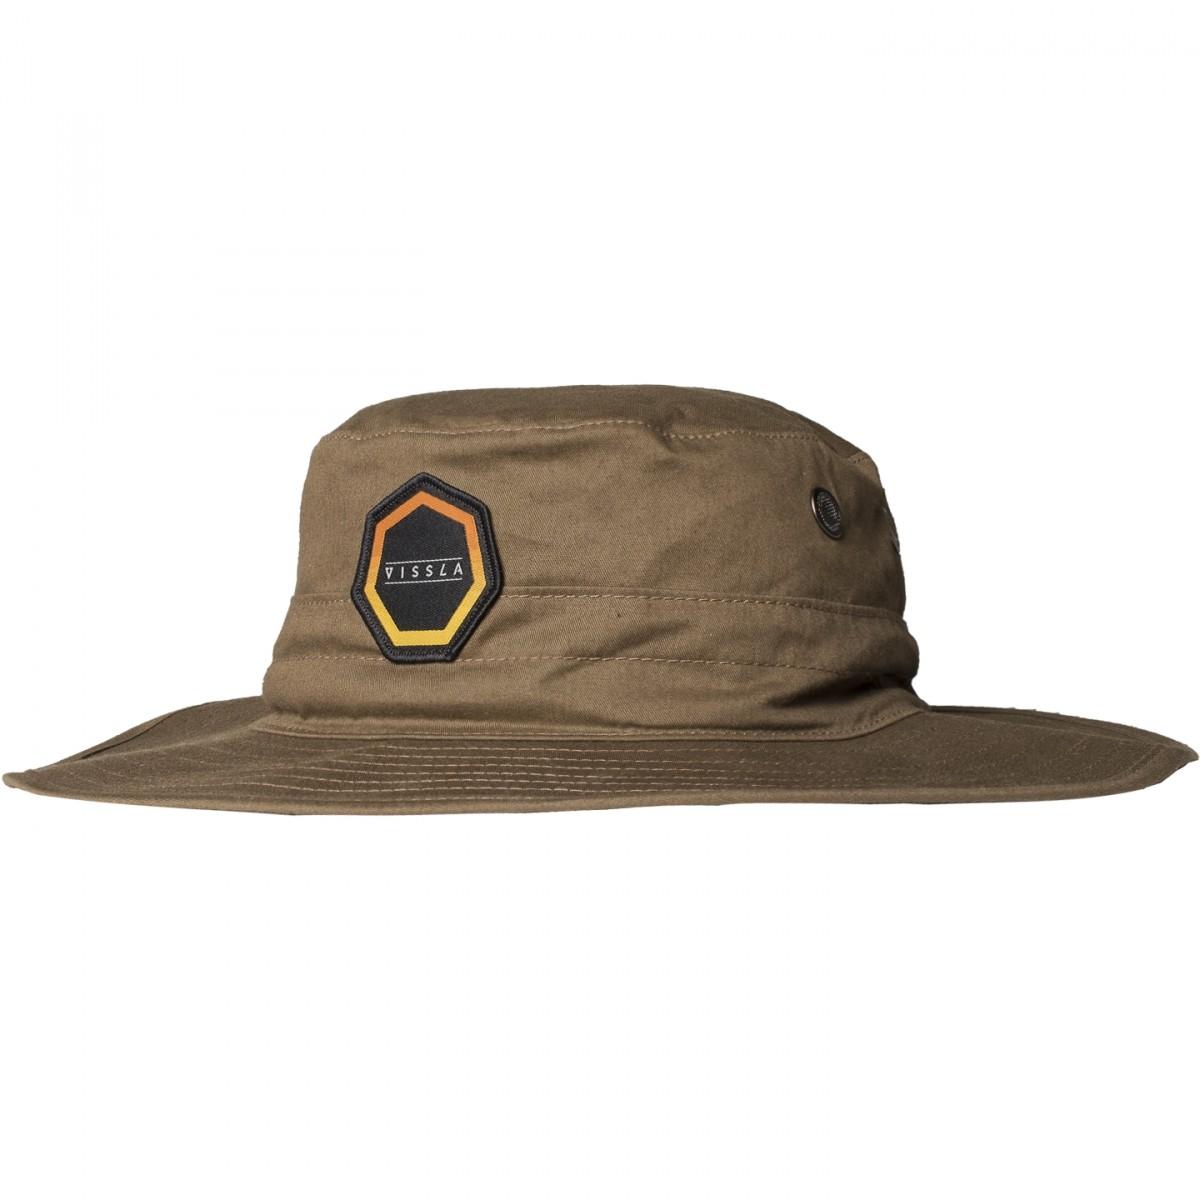 61edebb80cef5a Vissla Boonie Hat (Tobacco) - Καπέλα - Καπέλα-Σκουφιά - ΑΝΔΡΙΚΑ ...